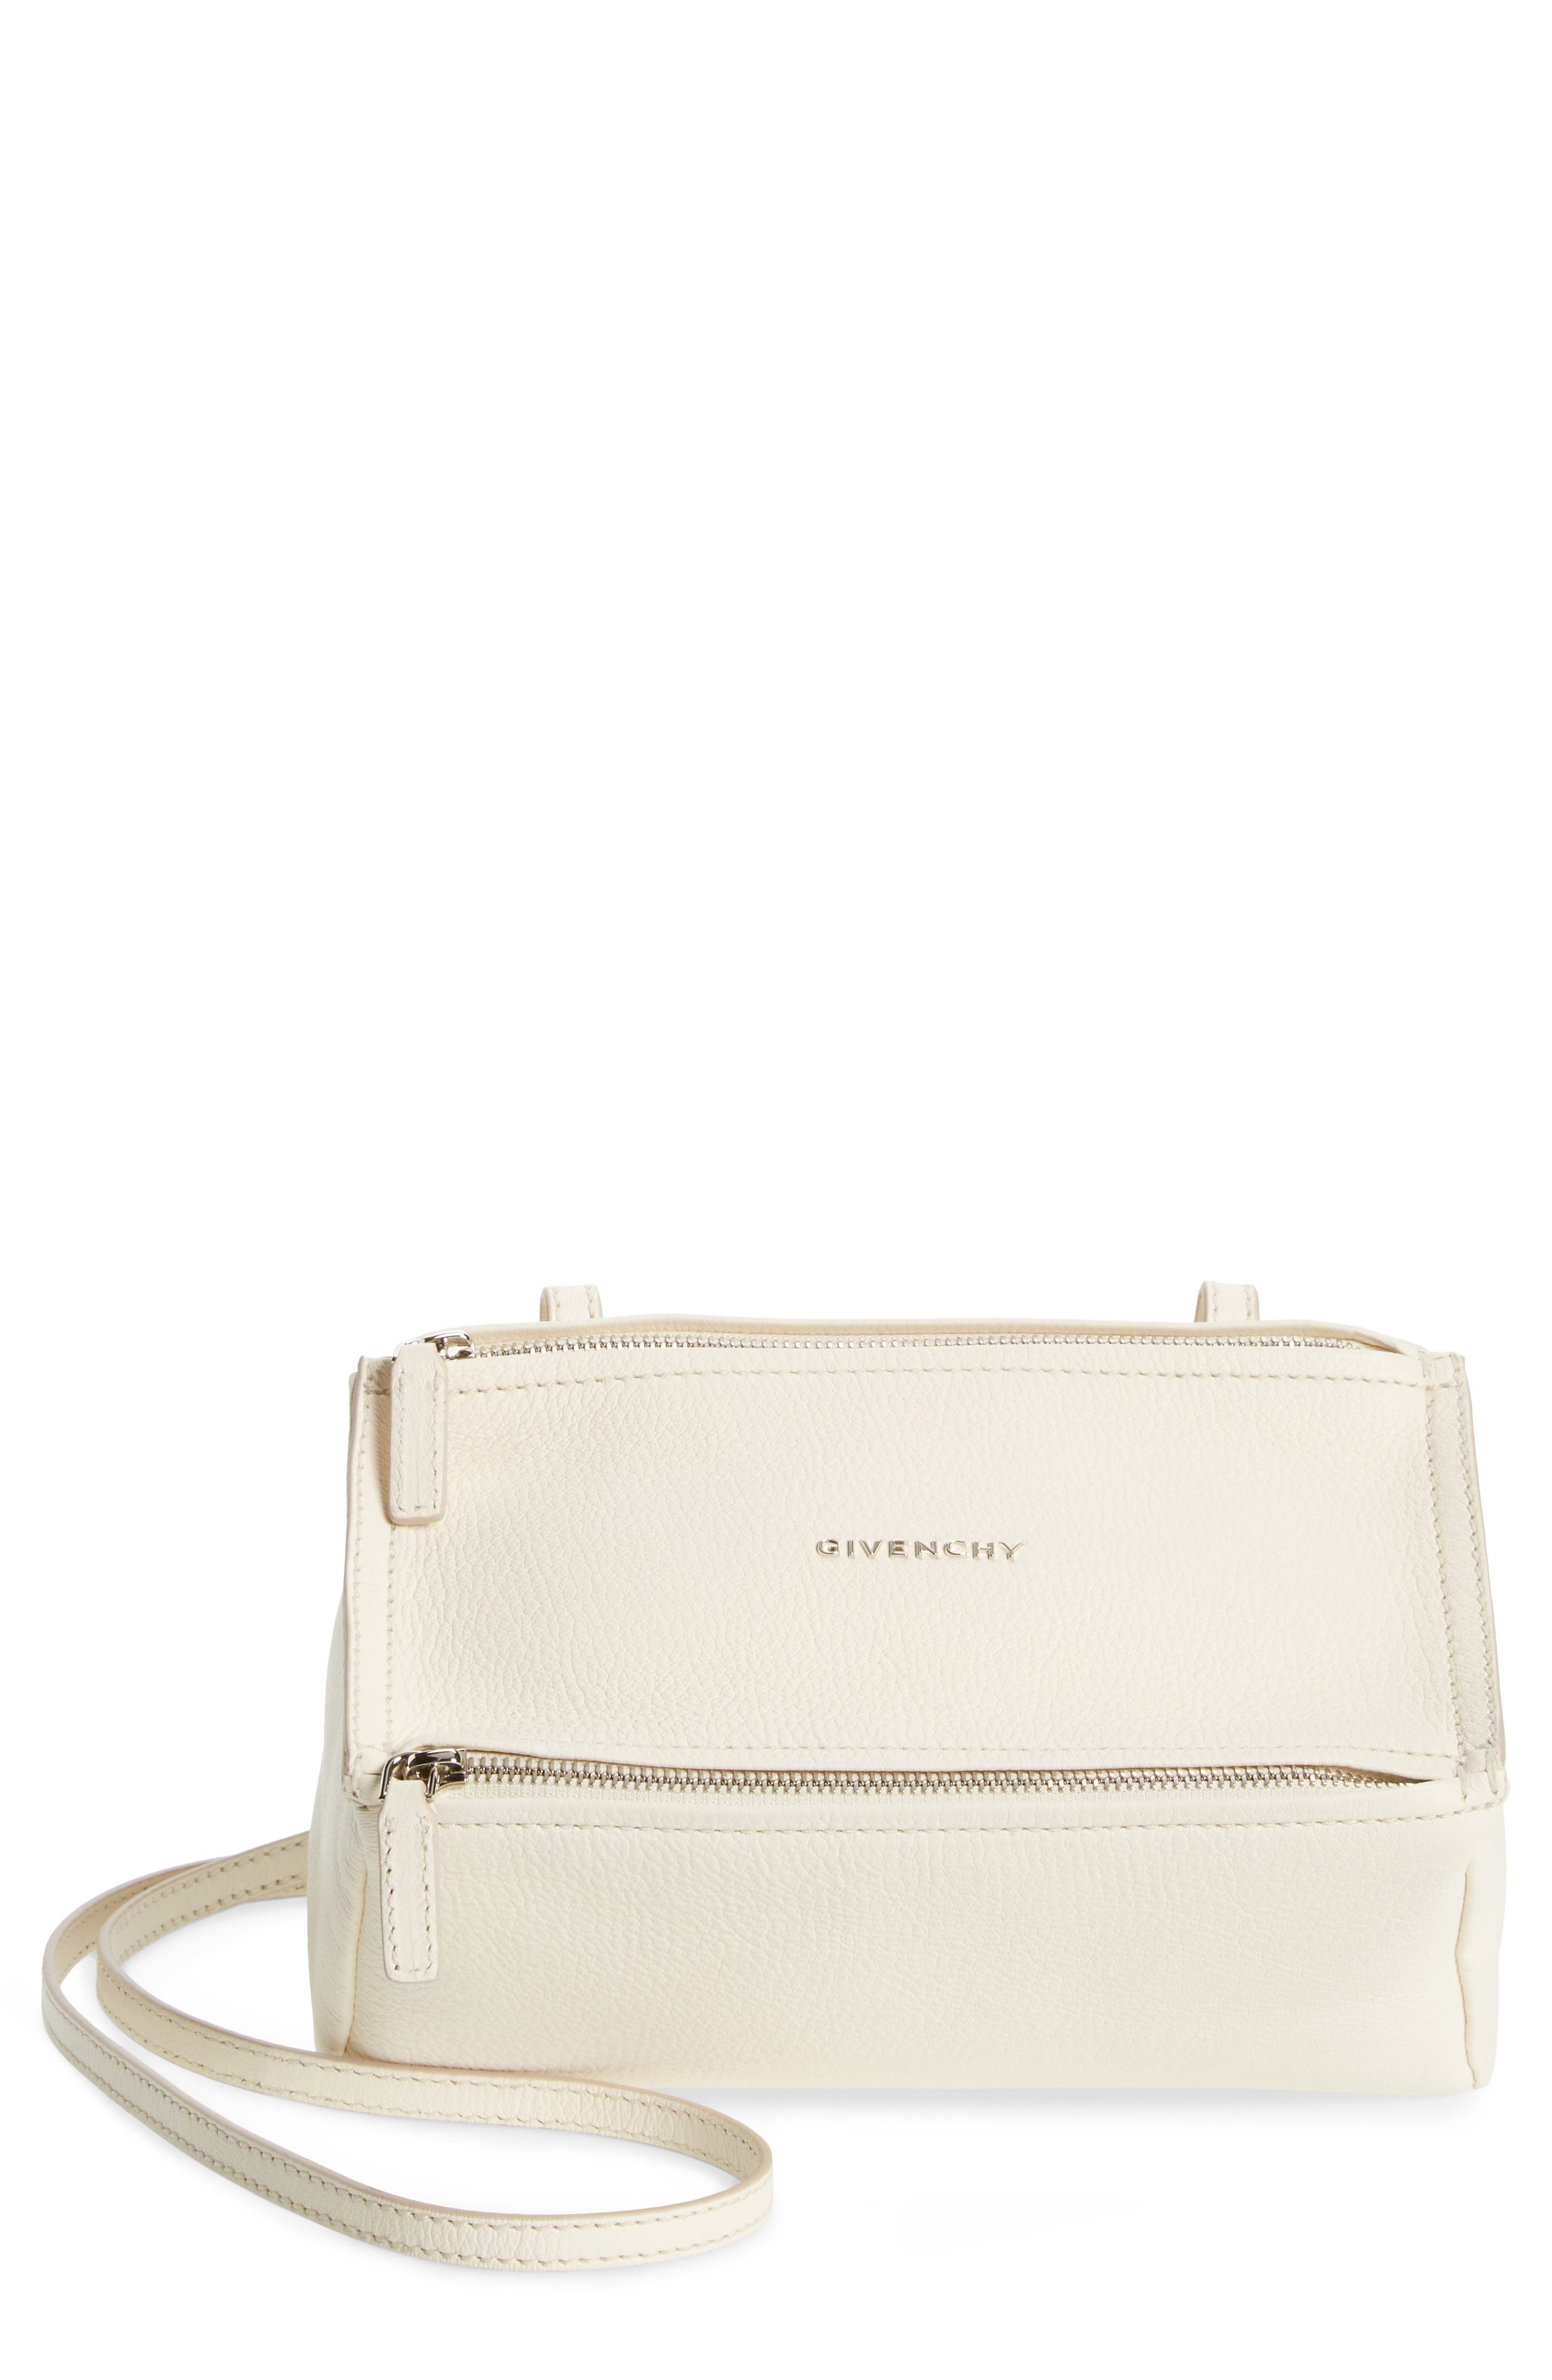 Main Image - Givenchy 'Mini Pandora' Sugar Leather Shoulder Bag